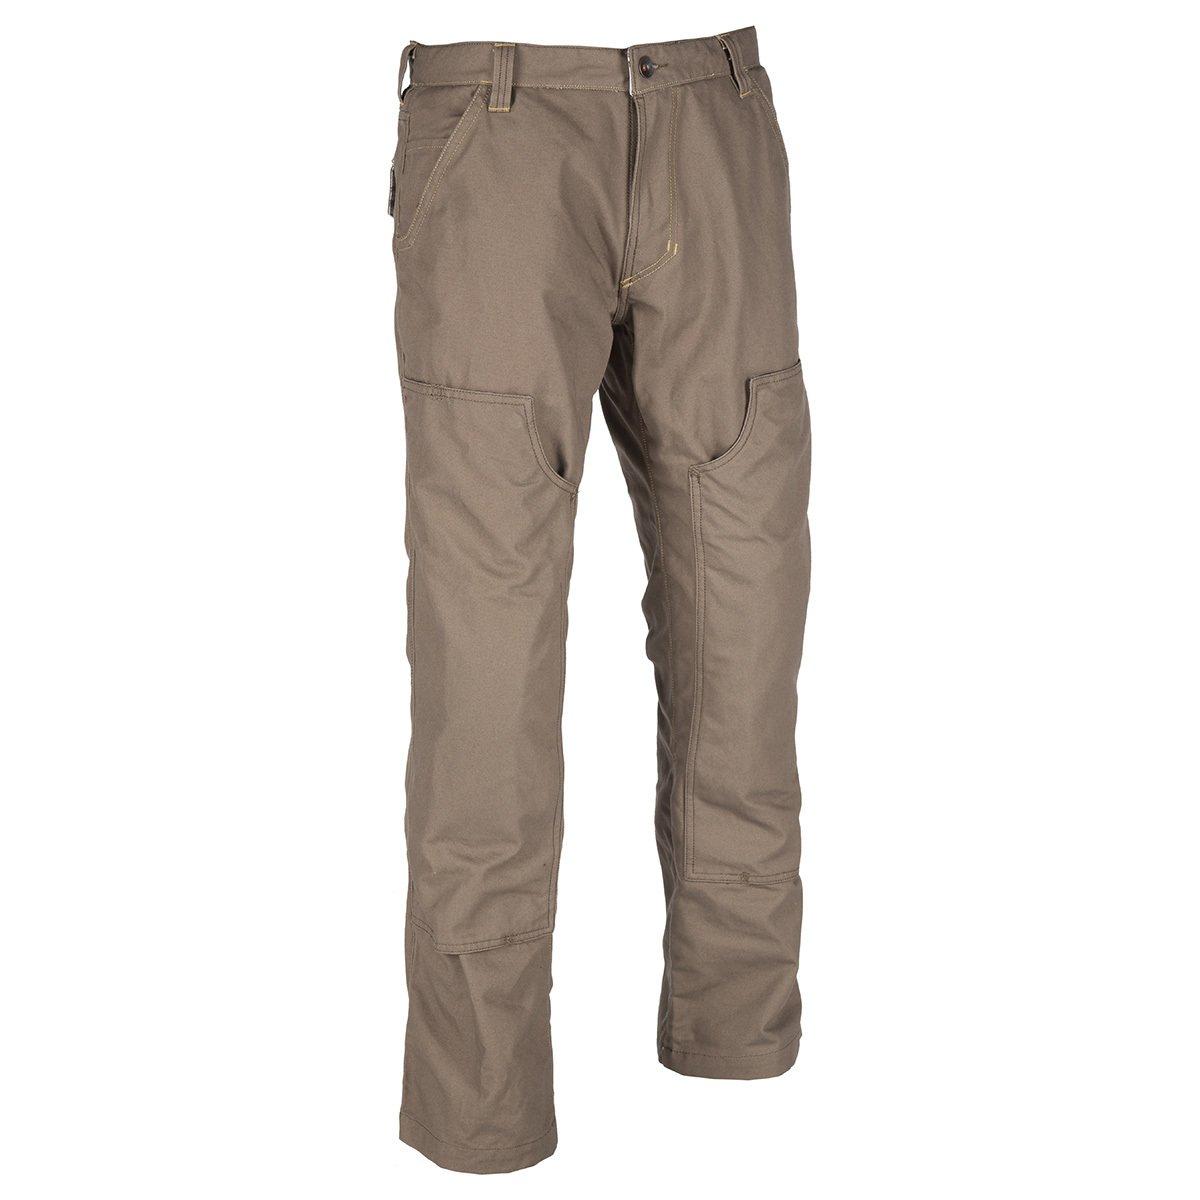 Klim Outrider Pant - 38 / Light Brown 3719-000-038-930